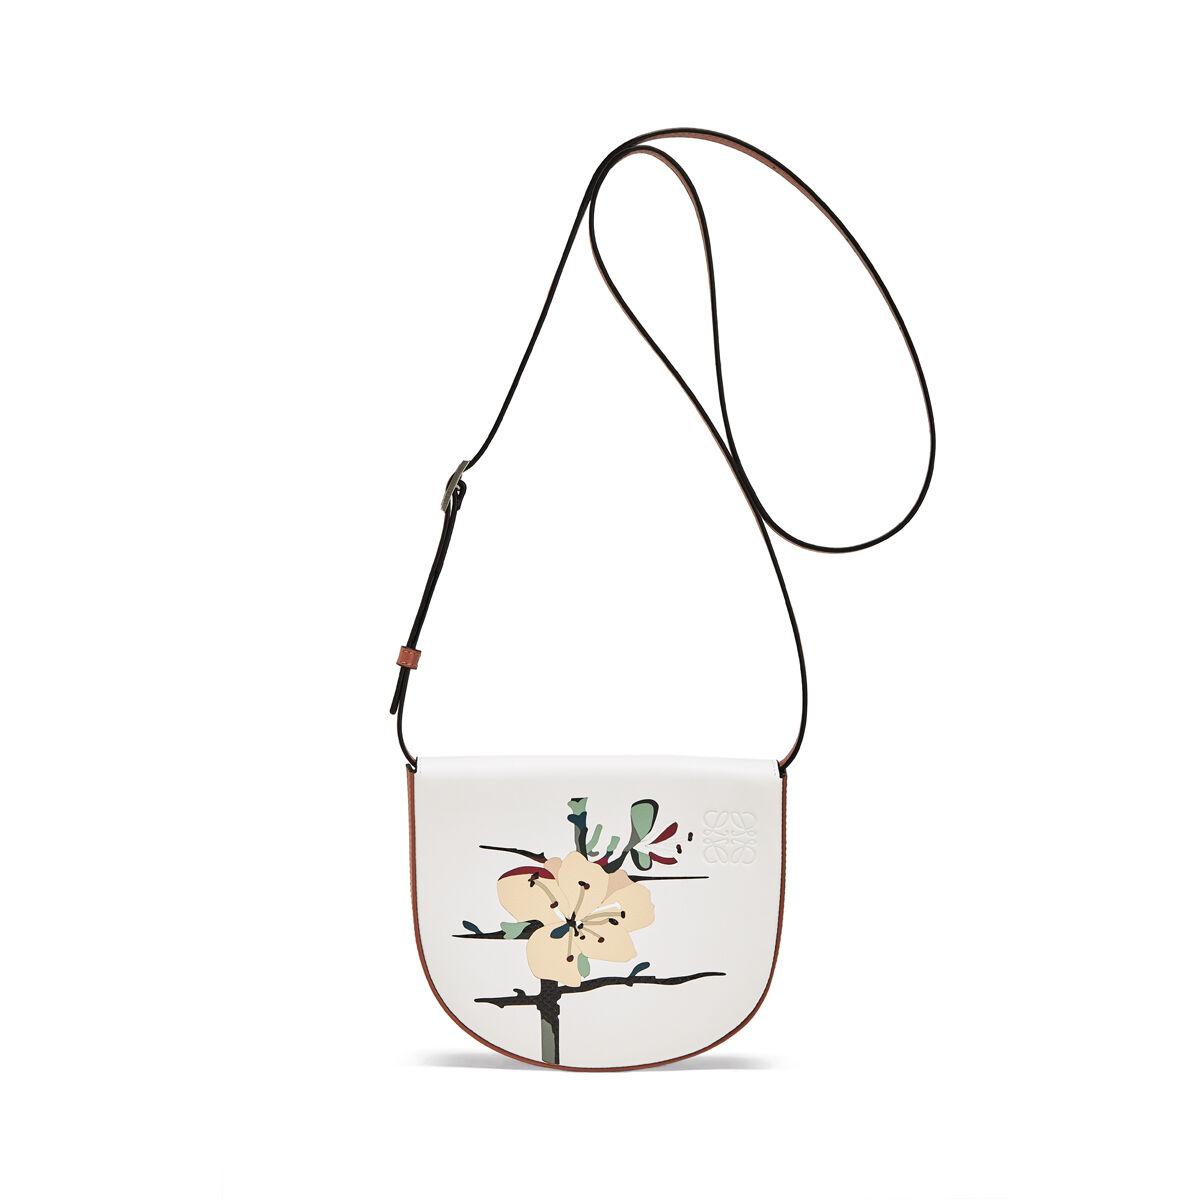 LOEWE Mini Bolso Heel Botanical Blanco Suave/Bronceado all